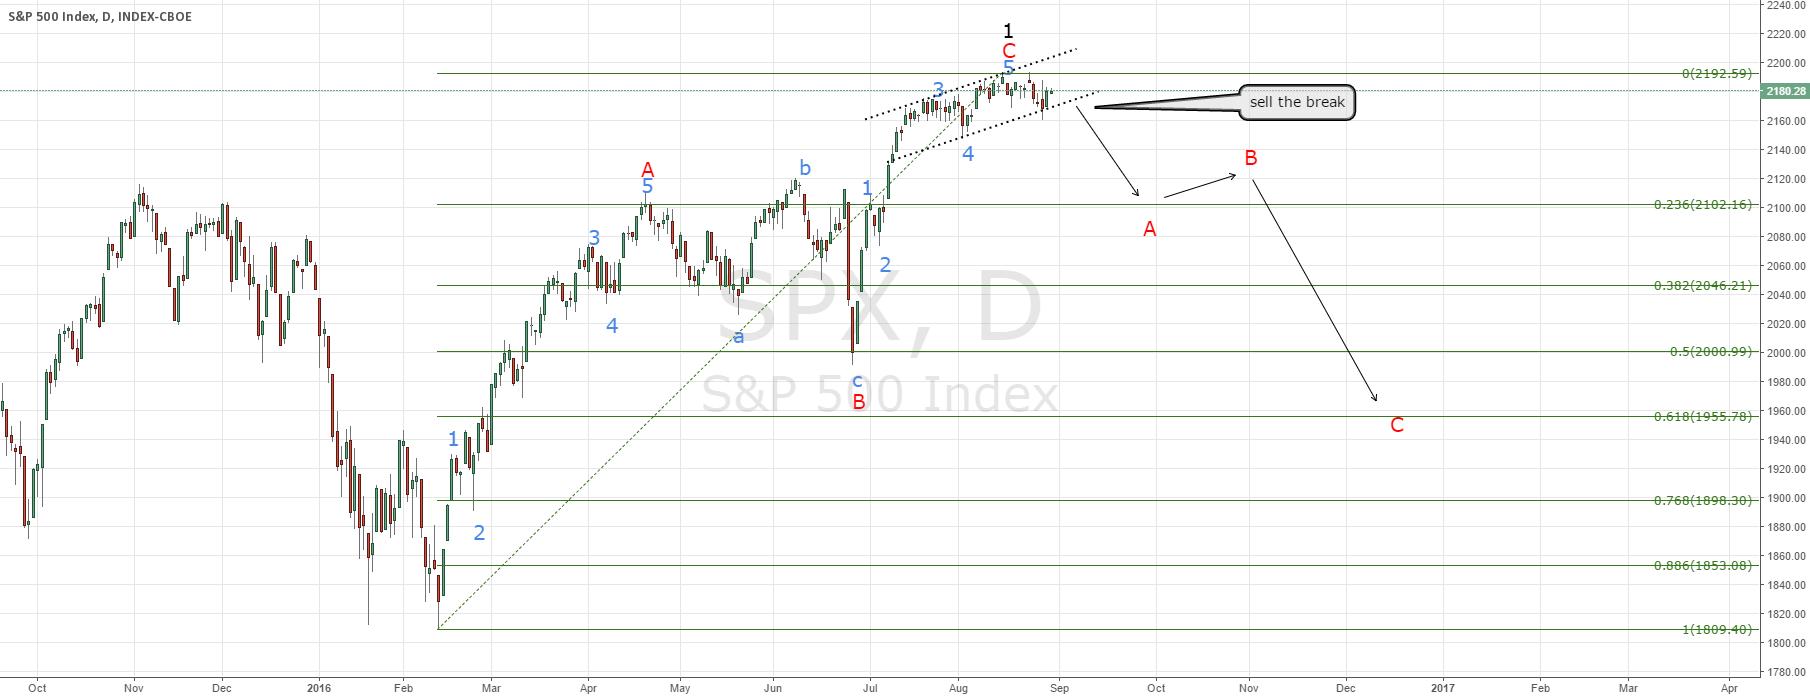 S&P 500 short